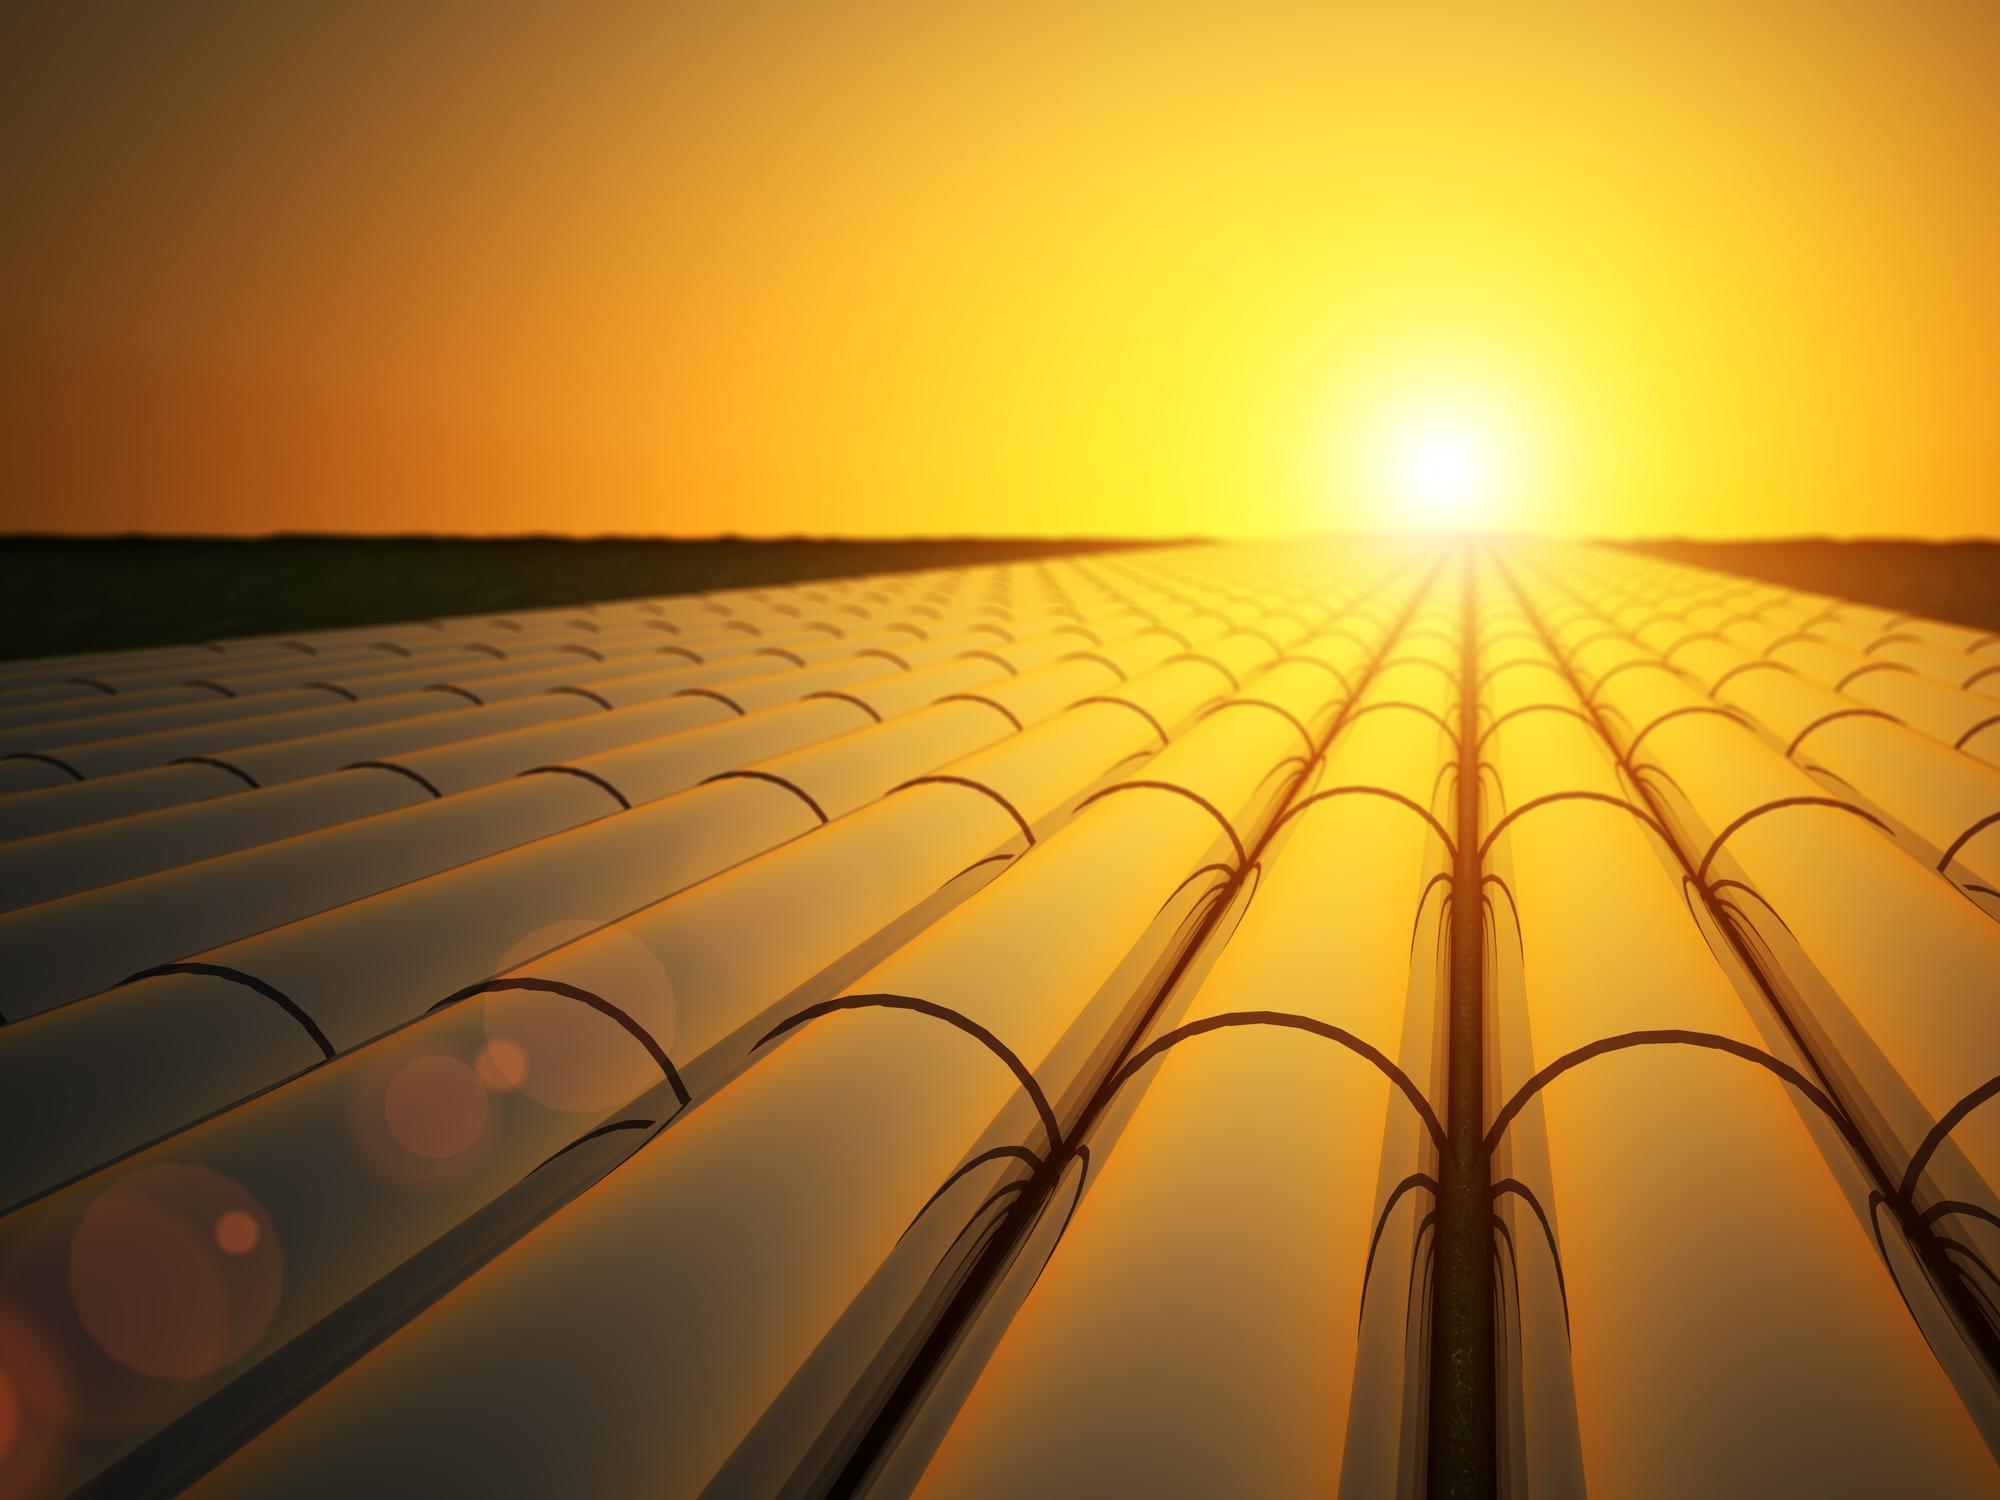 Pipelines heading toward the bright sun.